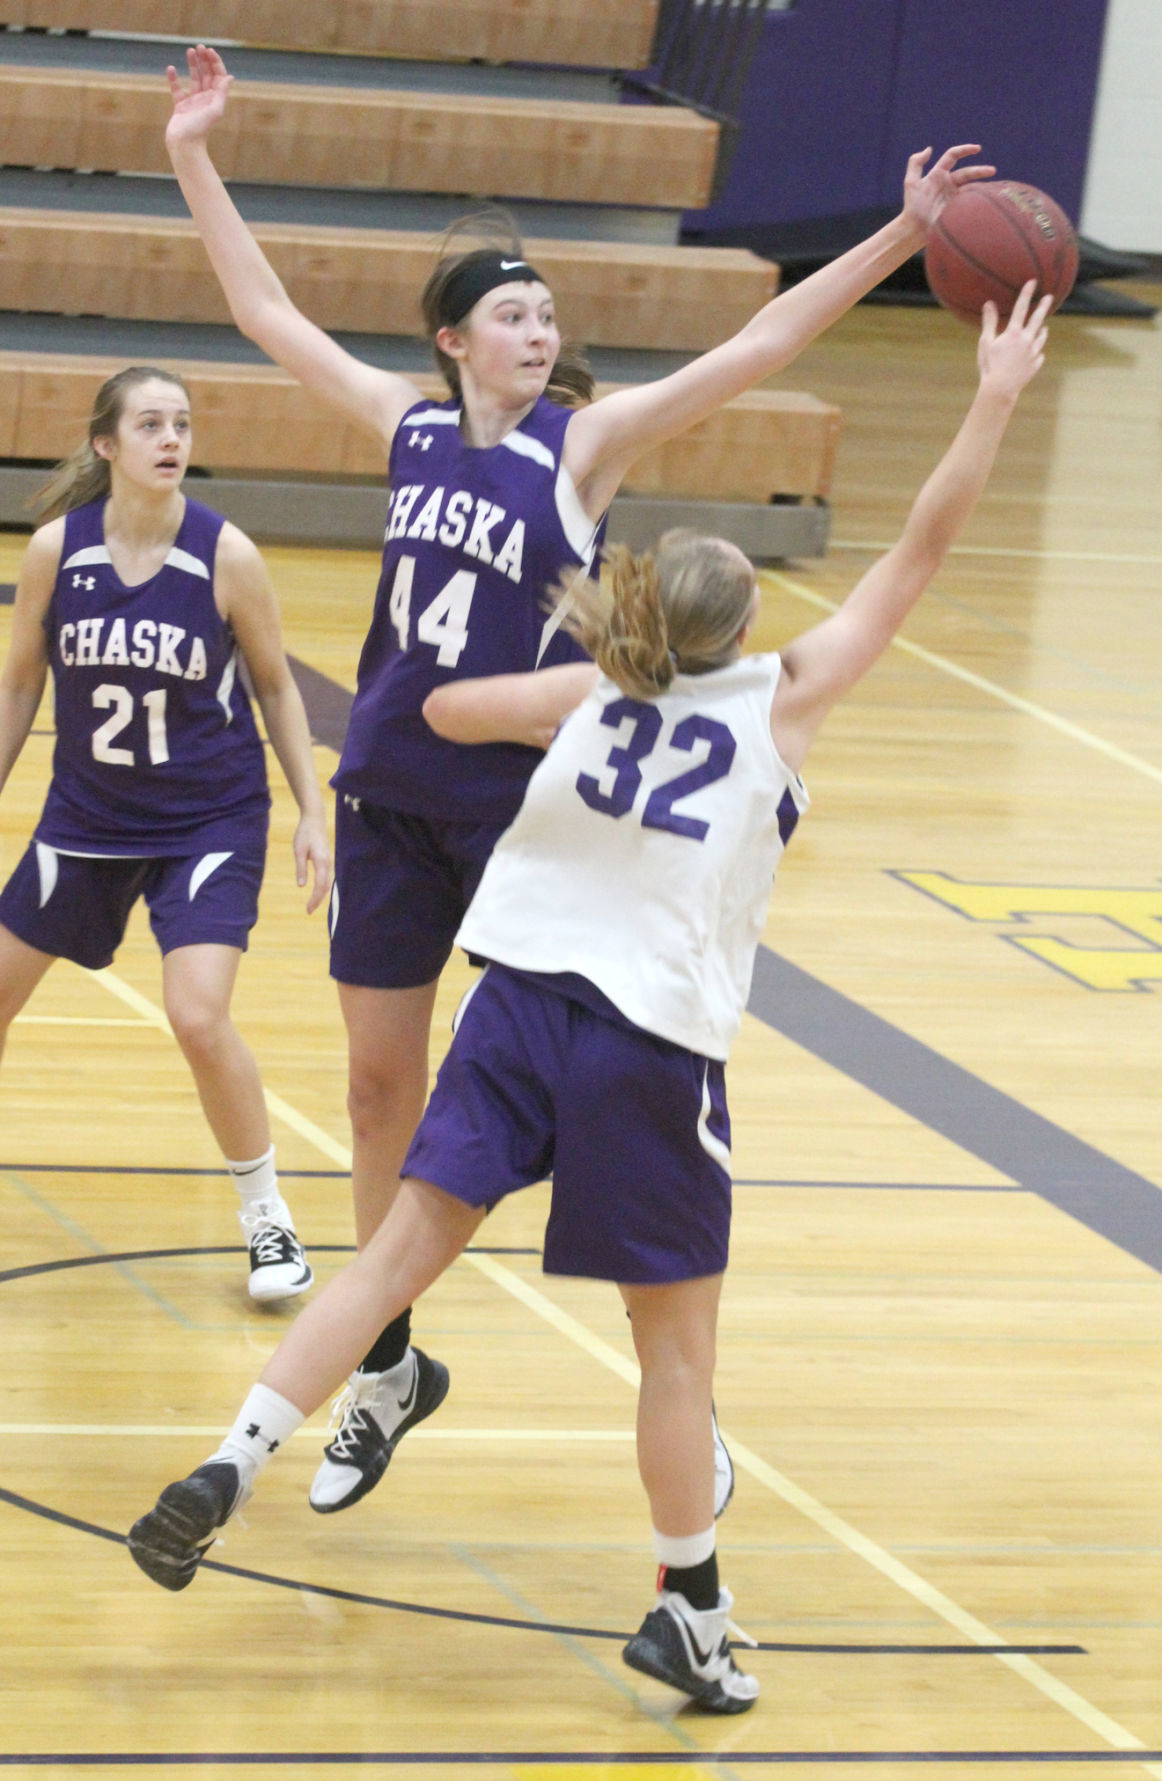 Chaska Basketball - Heir